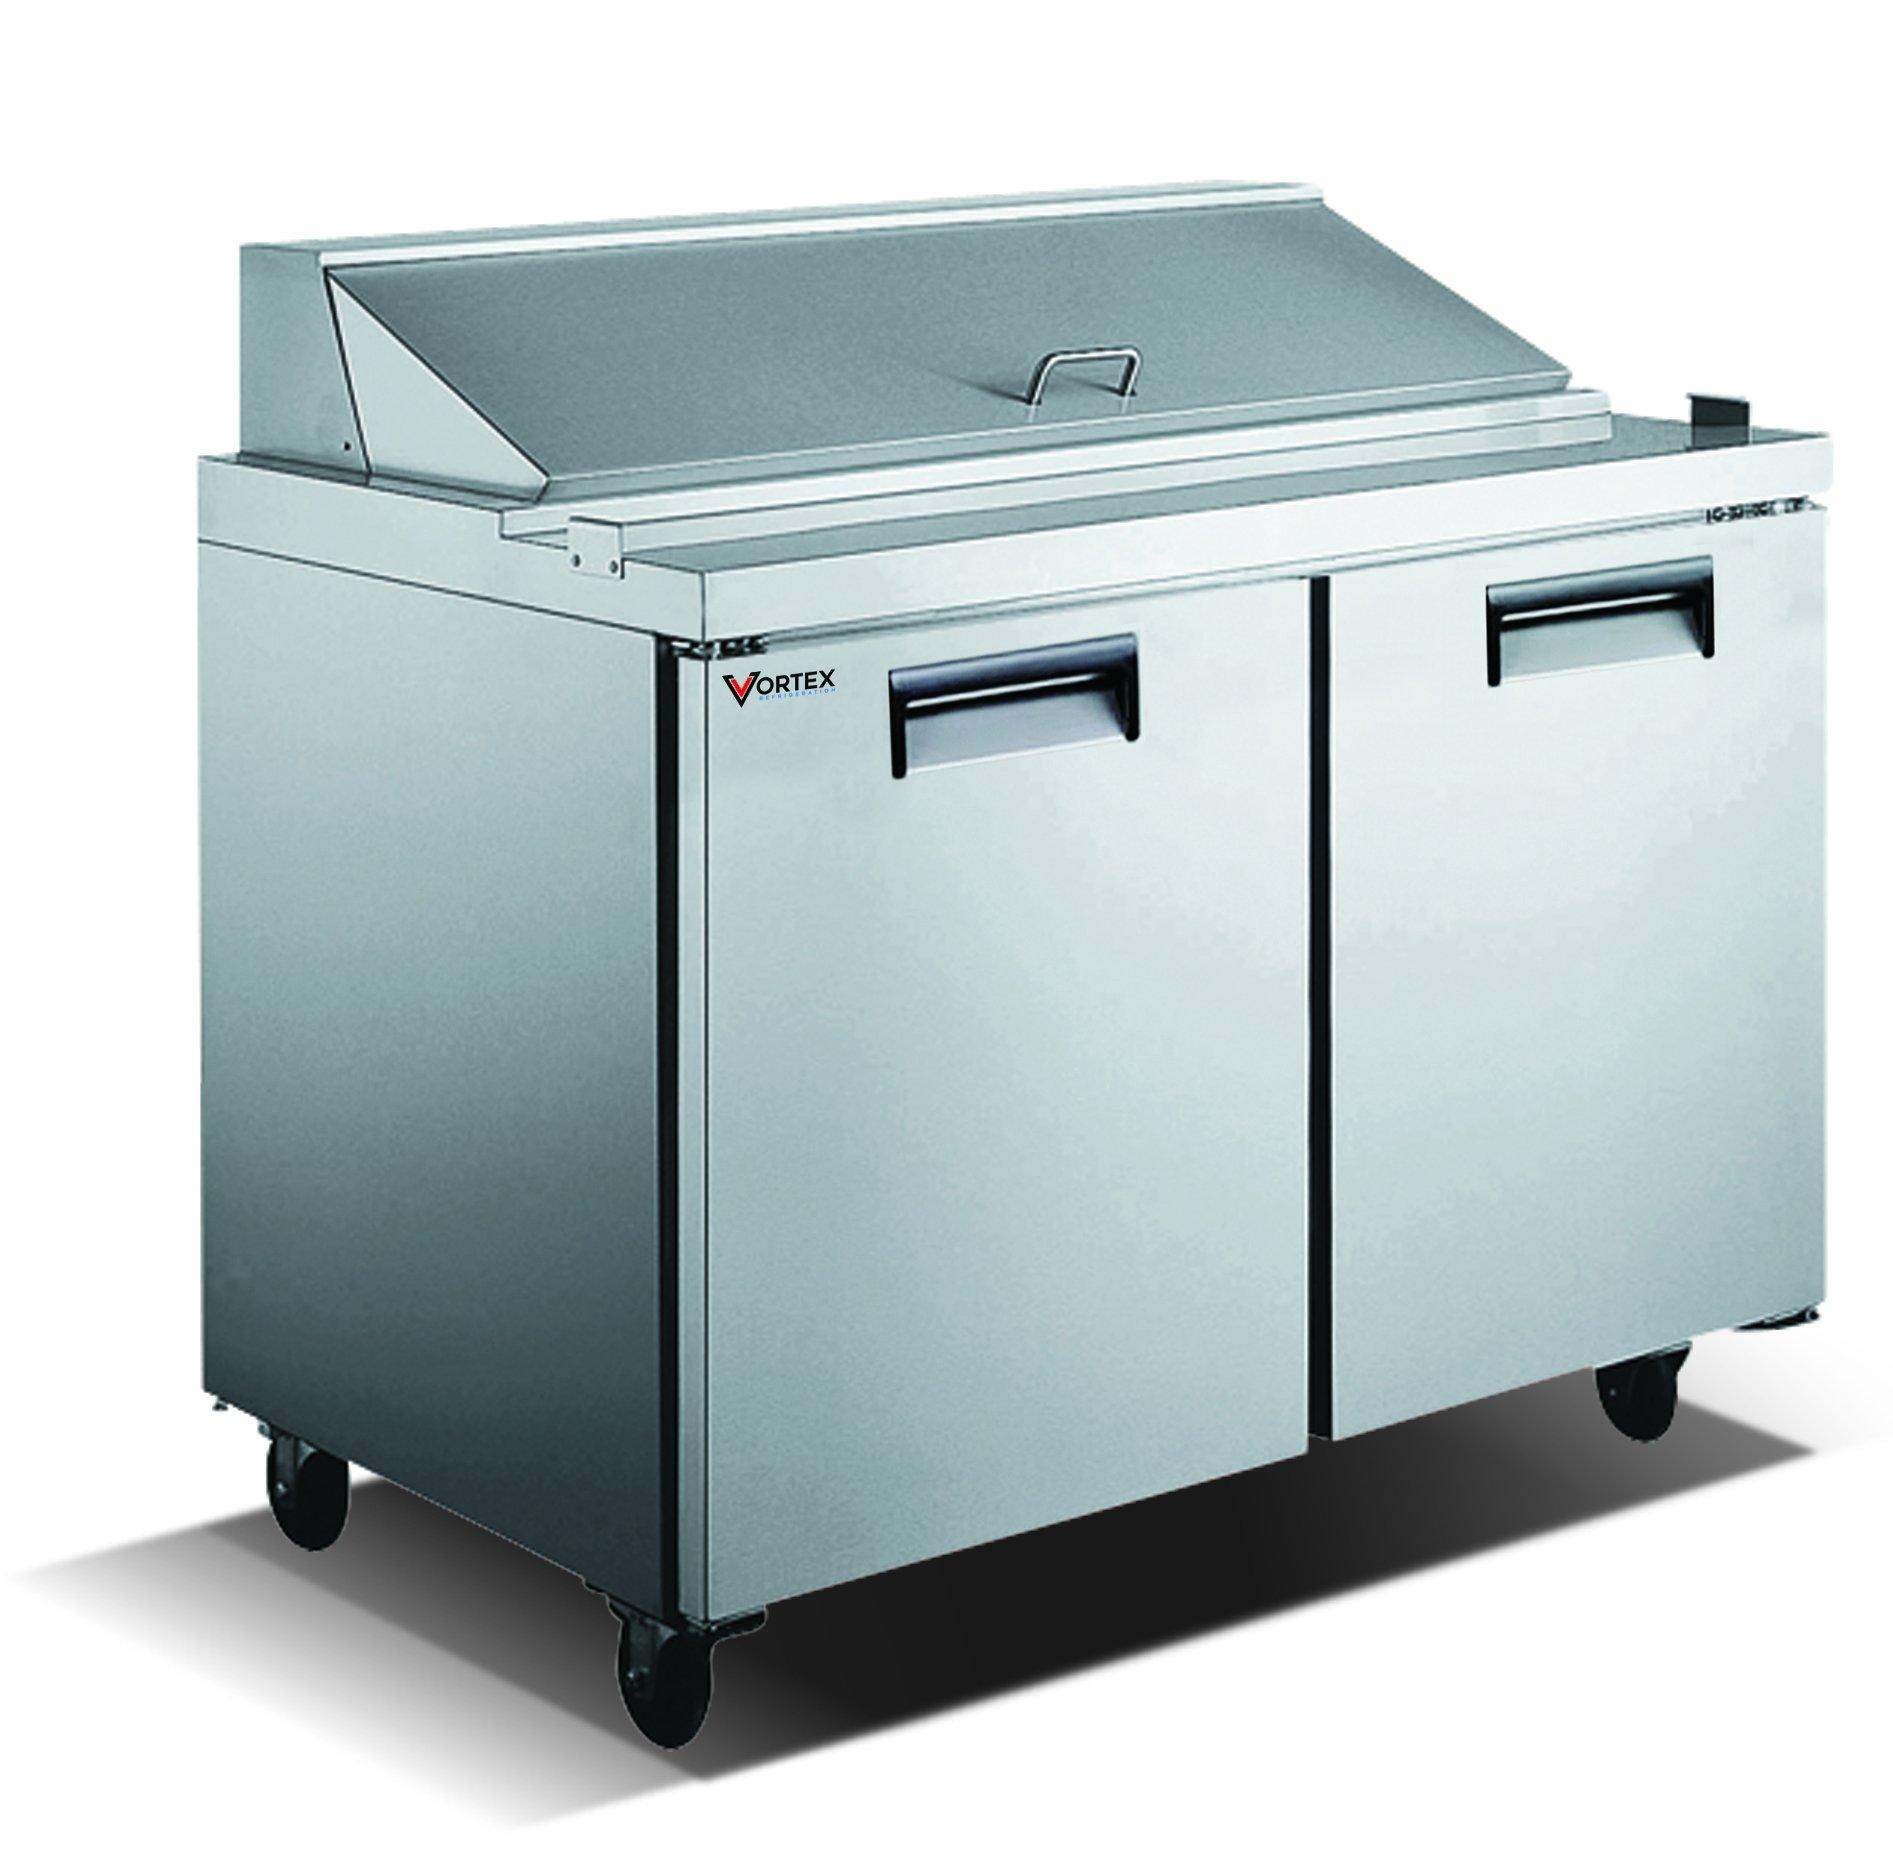 Vortex Refrigeration Commercial 2 Door 60'', 16 Pan Sandwich Prep Table - 15 Cu. Ft.